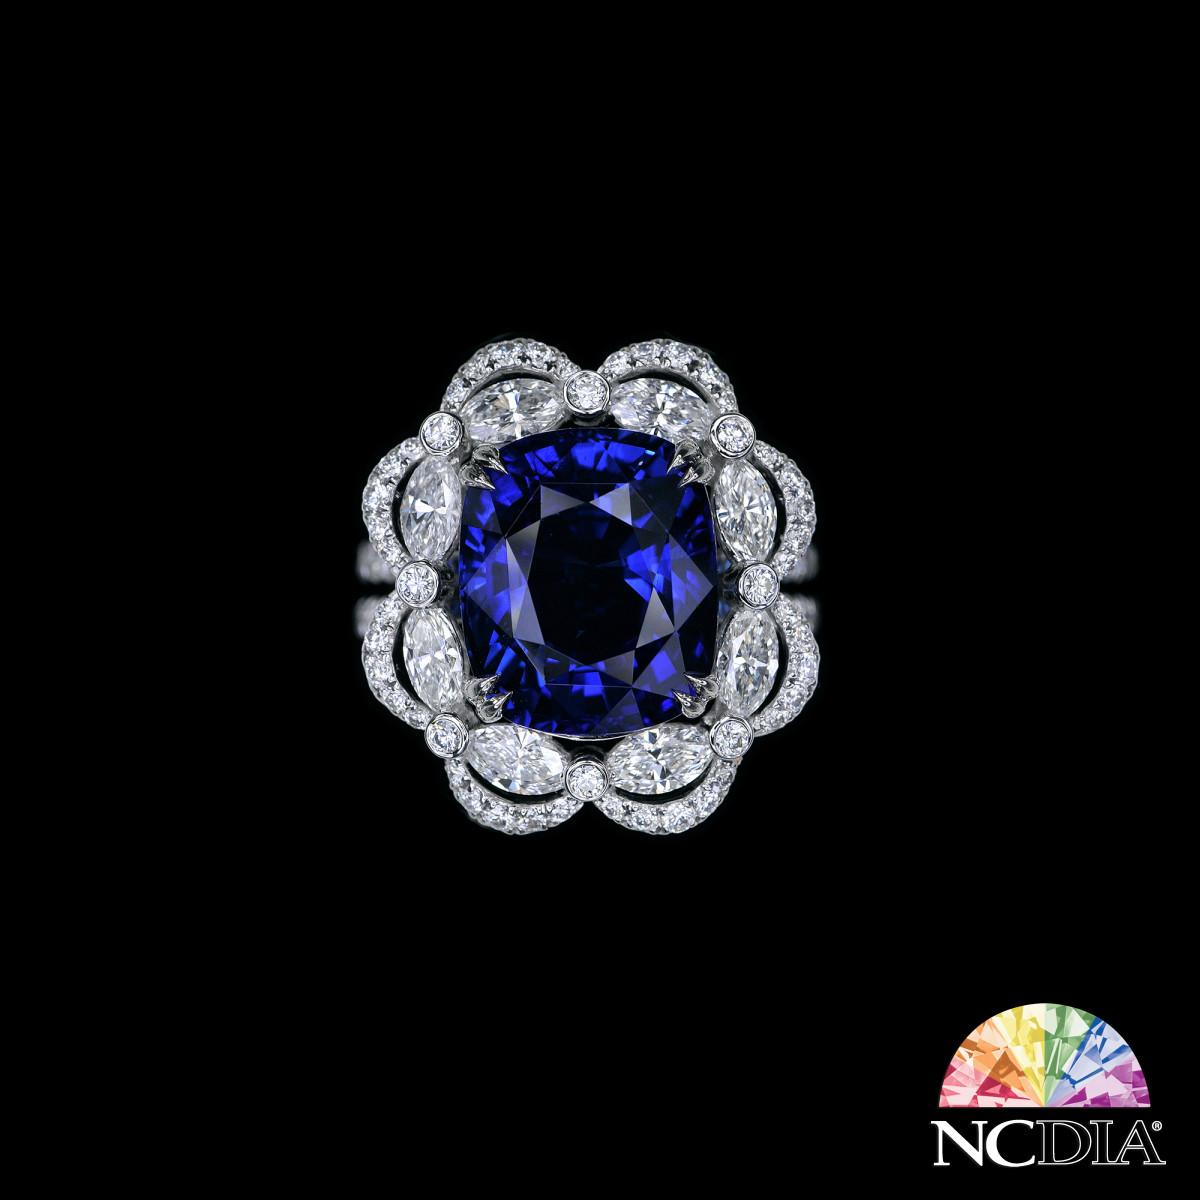 Over 8ct Cushion Cut Royal Blue Sri Lankan Sapphire Diamond Ring, GRS cert ava.